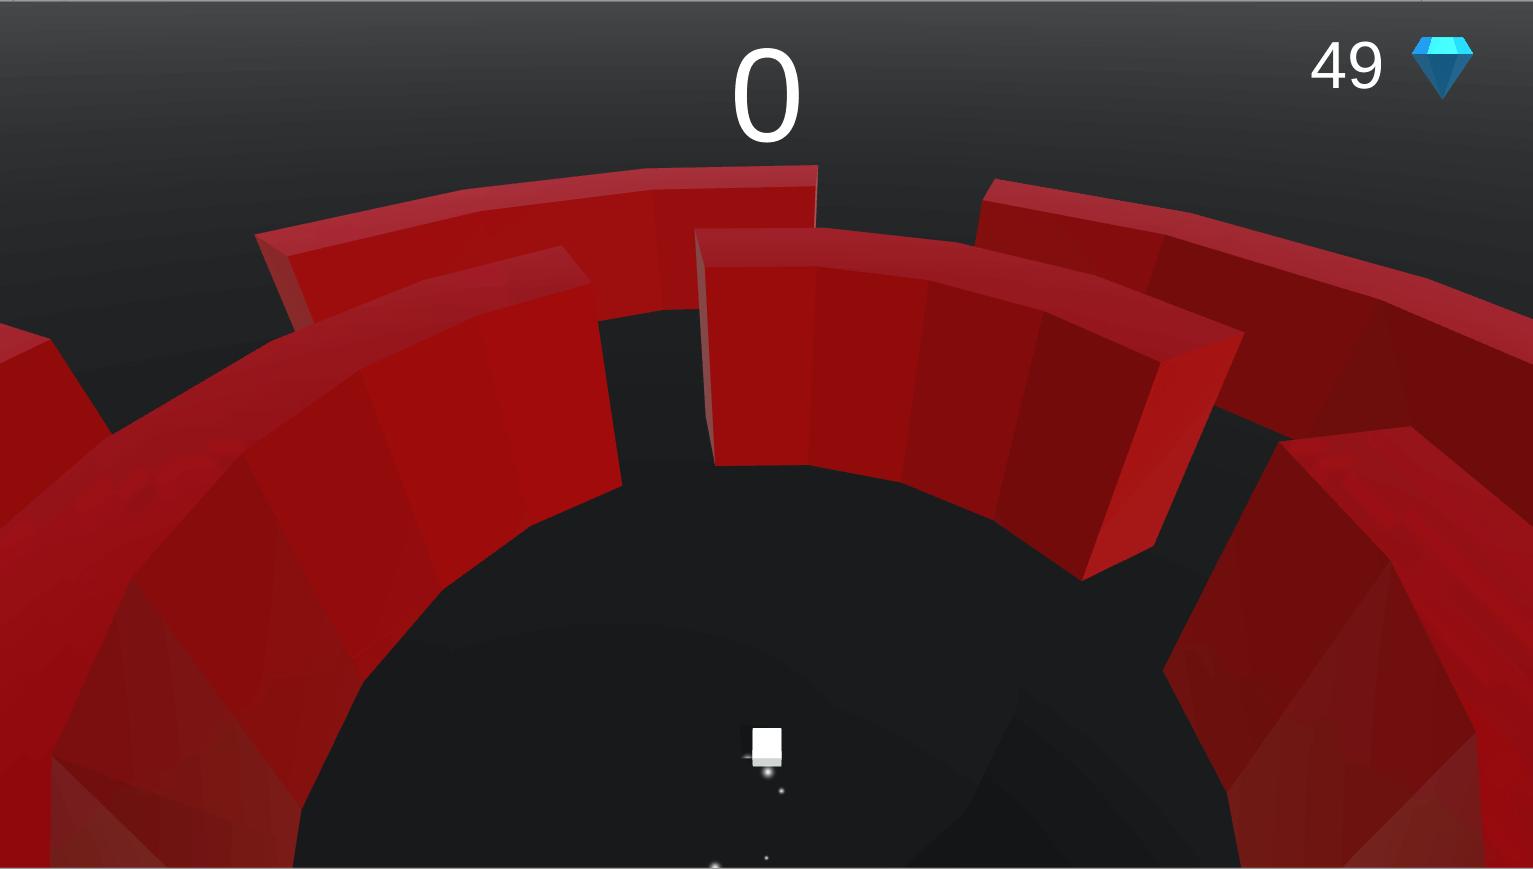 Mazeturn - Complete Unity Game